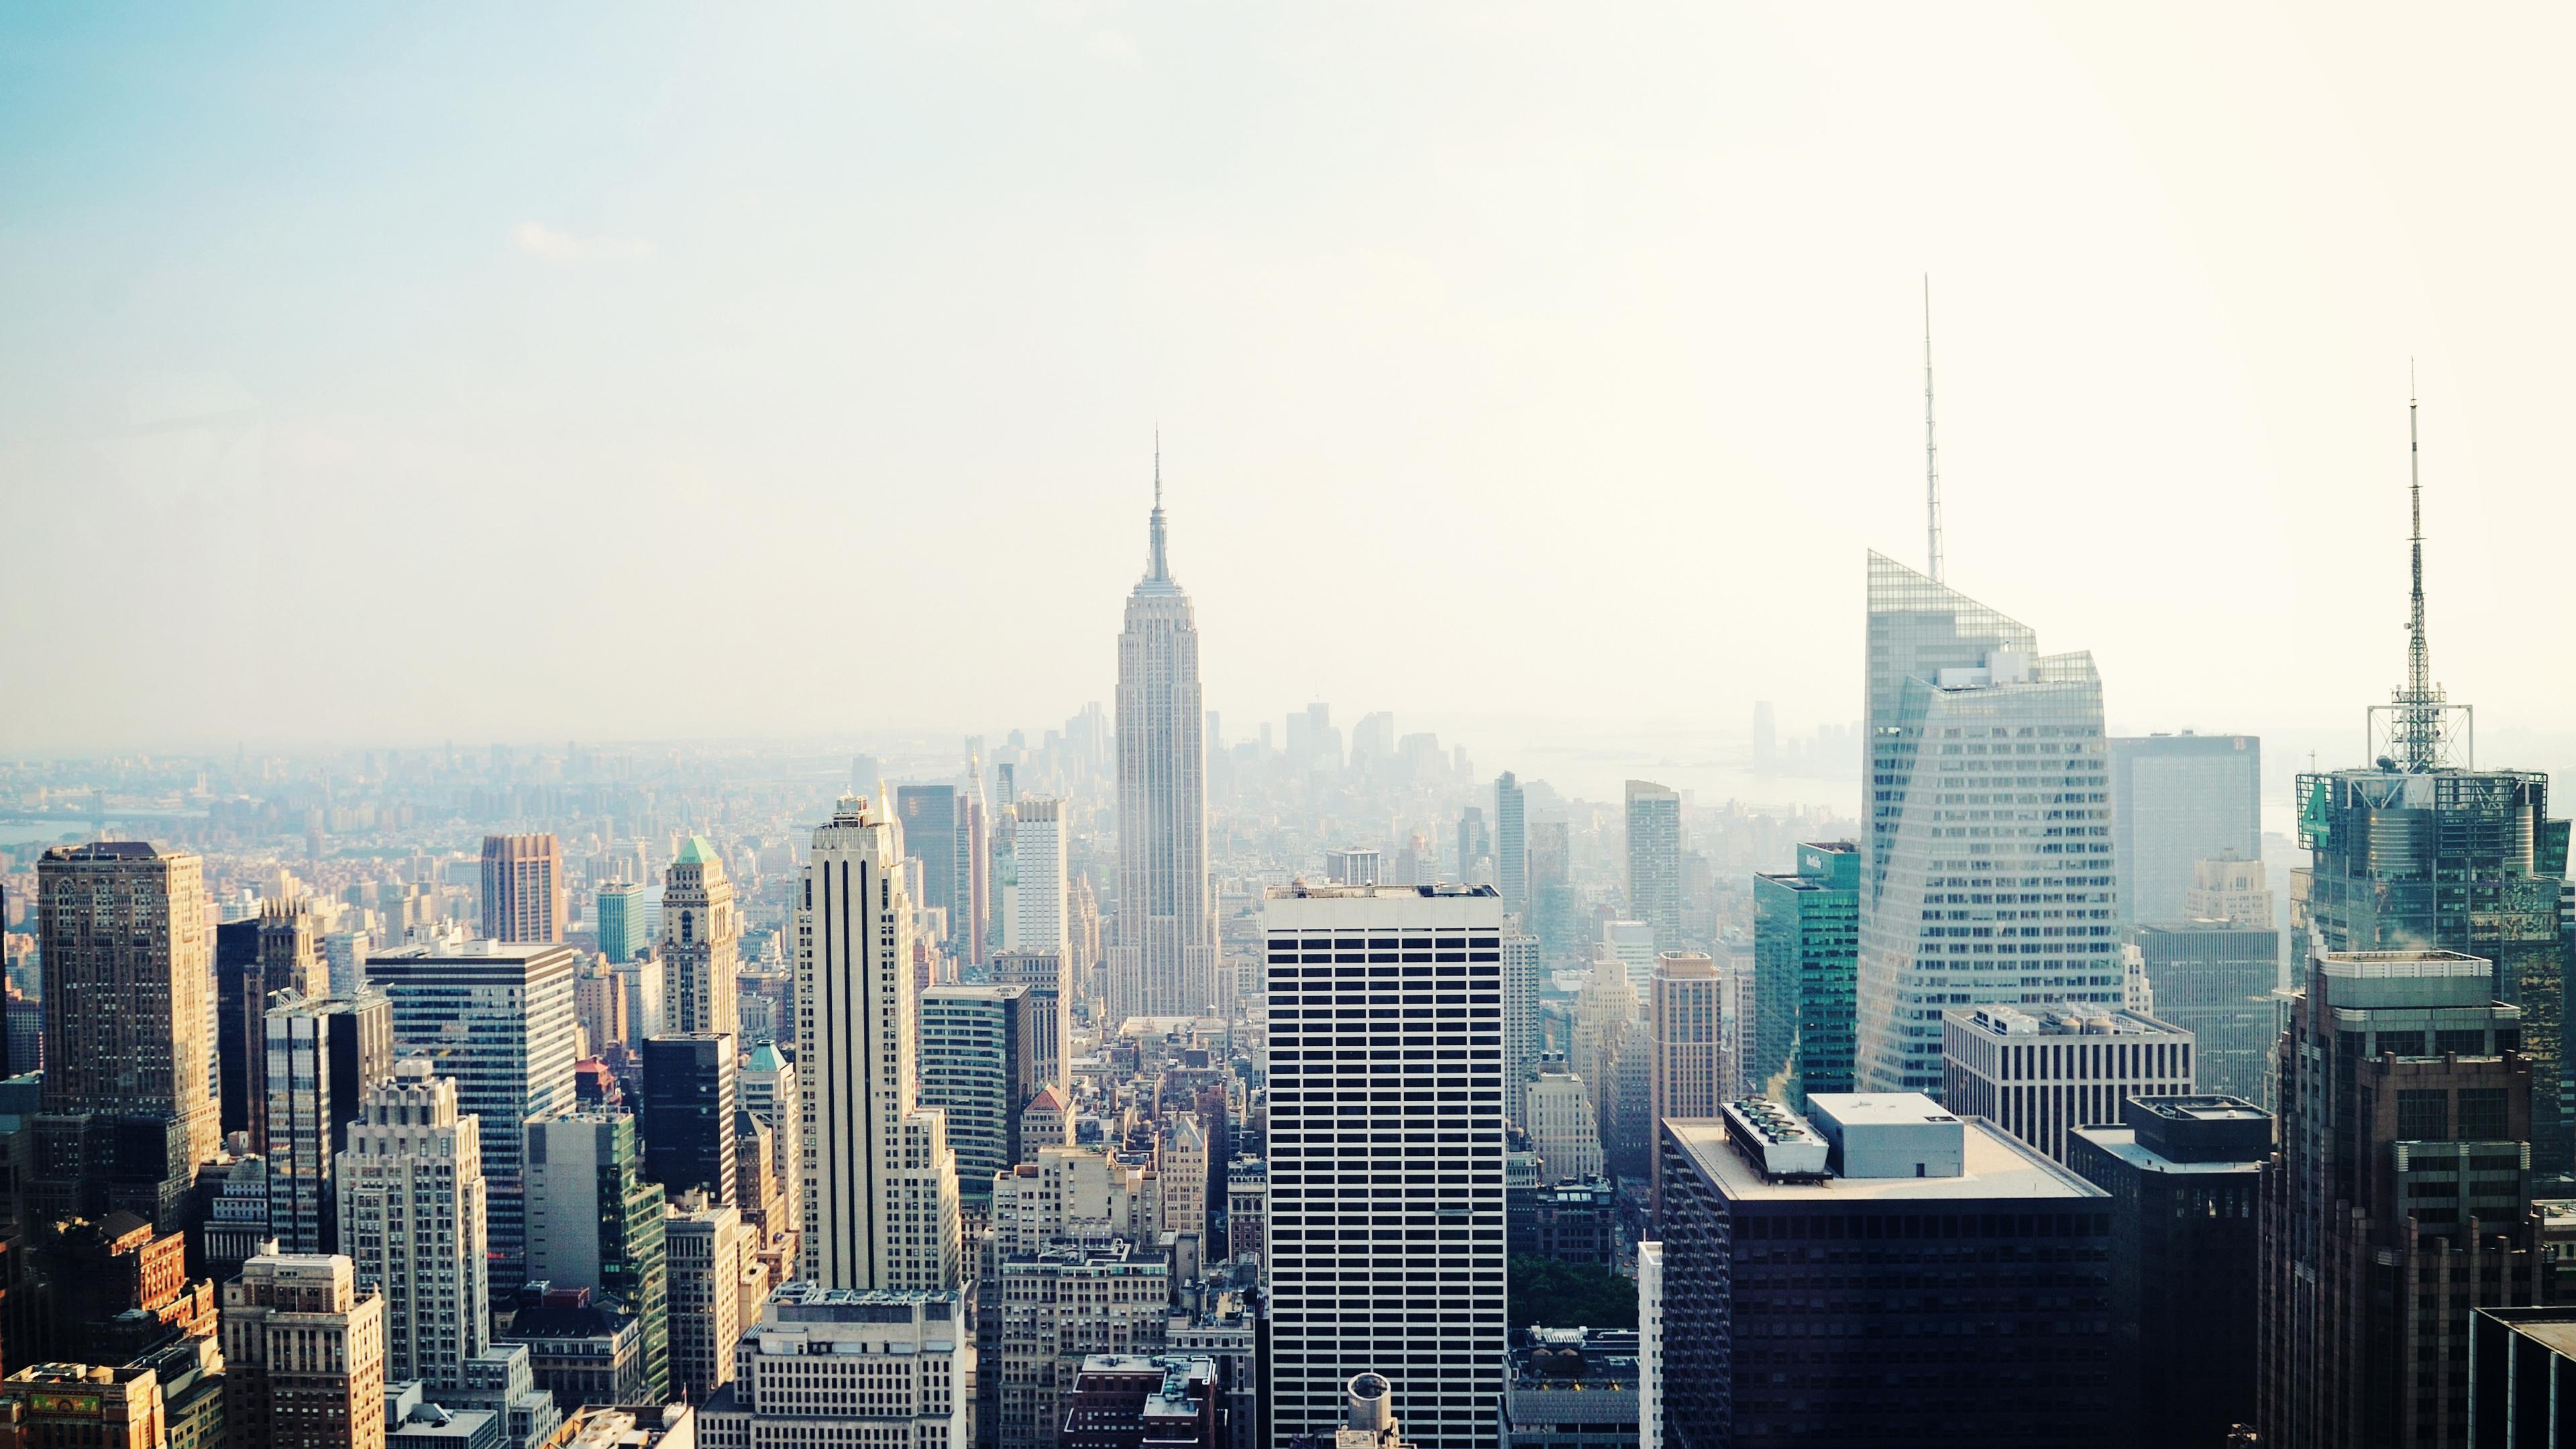 new york empire street building 1560535798 - New York Empire Street Building - world wallpapers, skyscraper wallpapers, new york wallpapers, hd-wallpapers, city wallpapers, building wallpapers, 4k-wallpapers